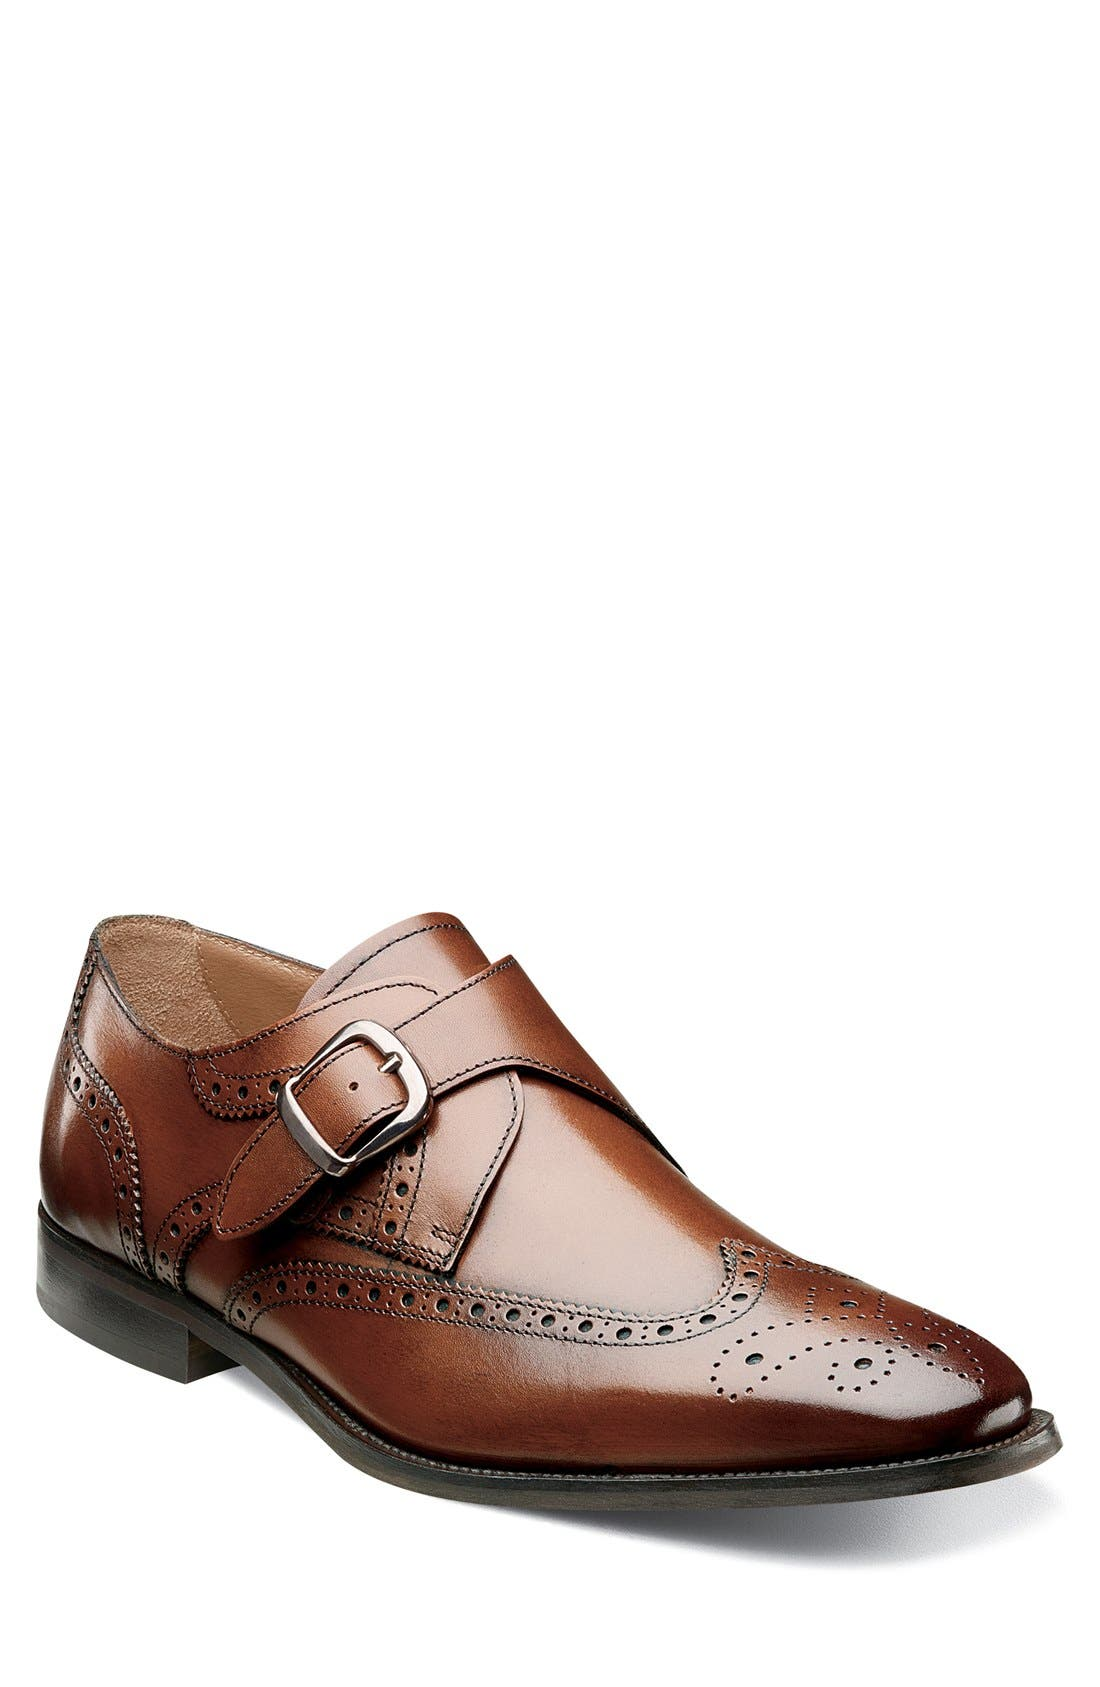 'Sabato' Wingtip Monk Strap Shoe,                             Main thumbnail 1, color,                             Medium Brown